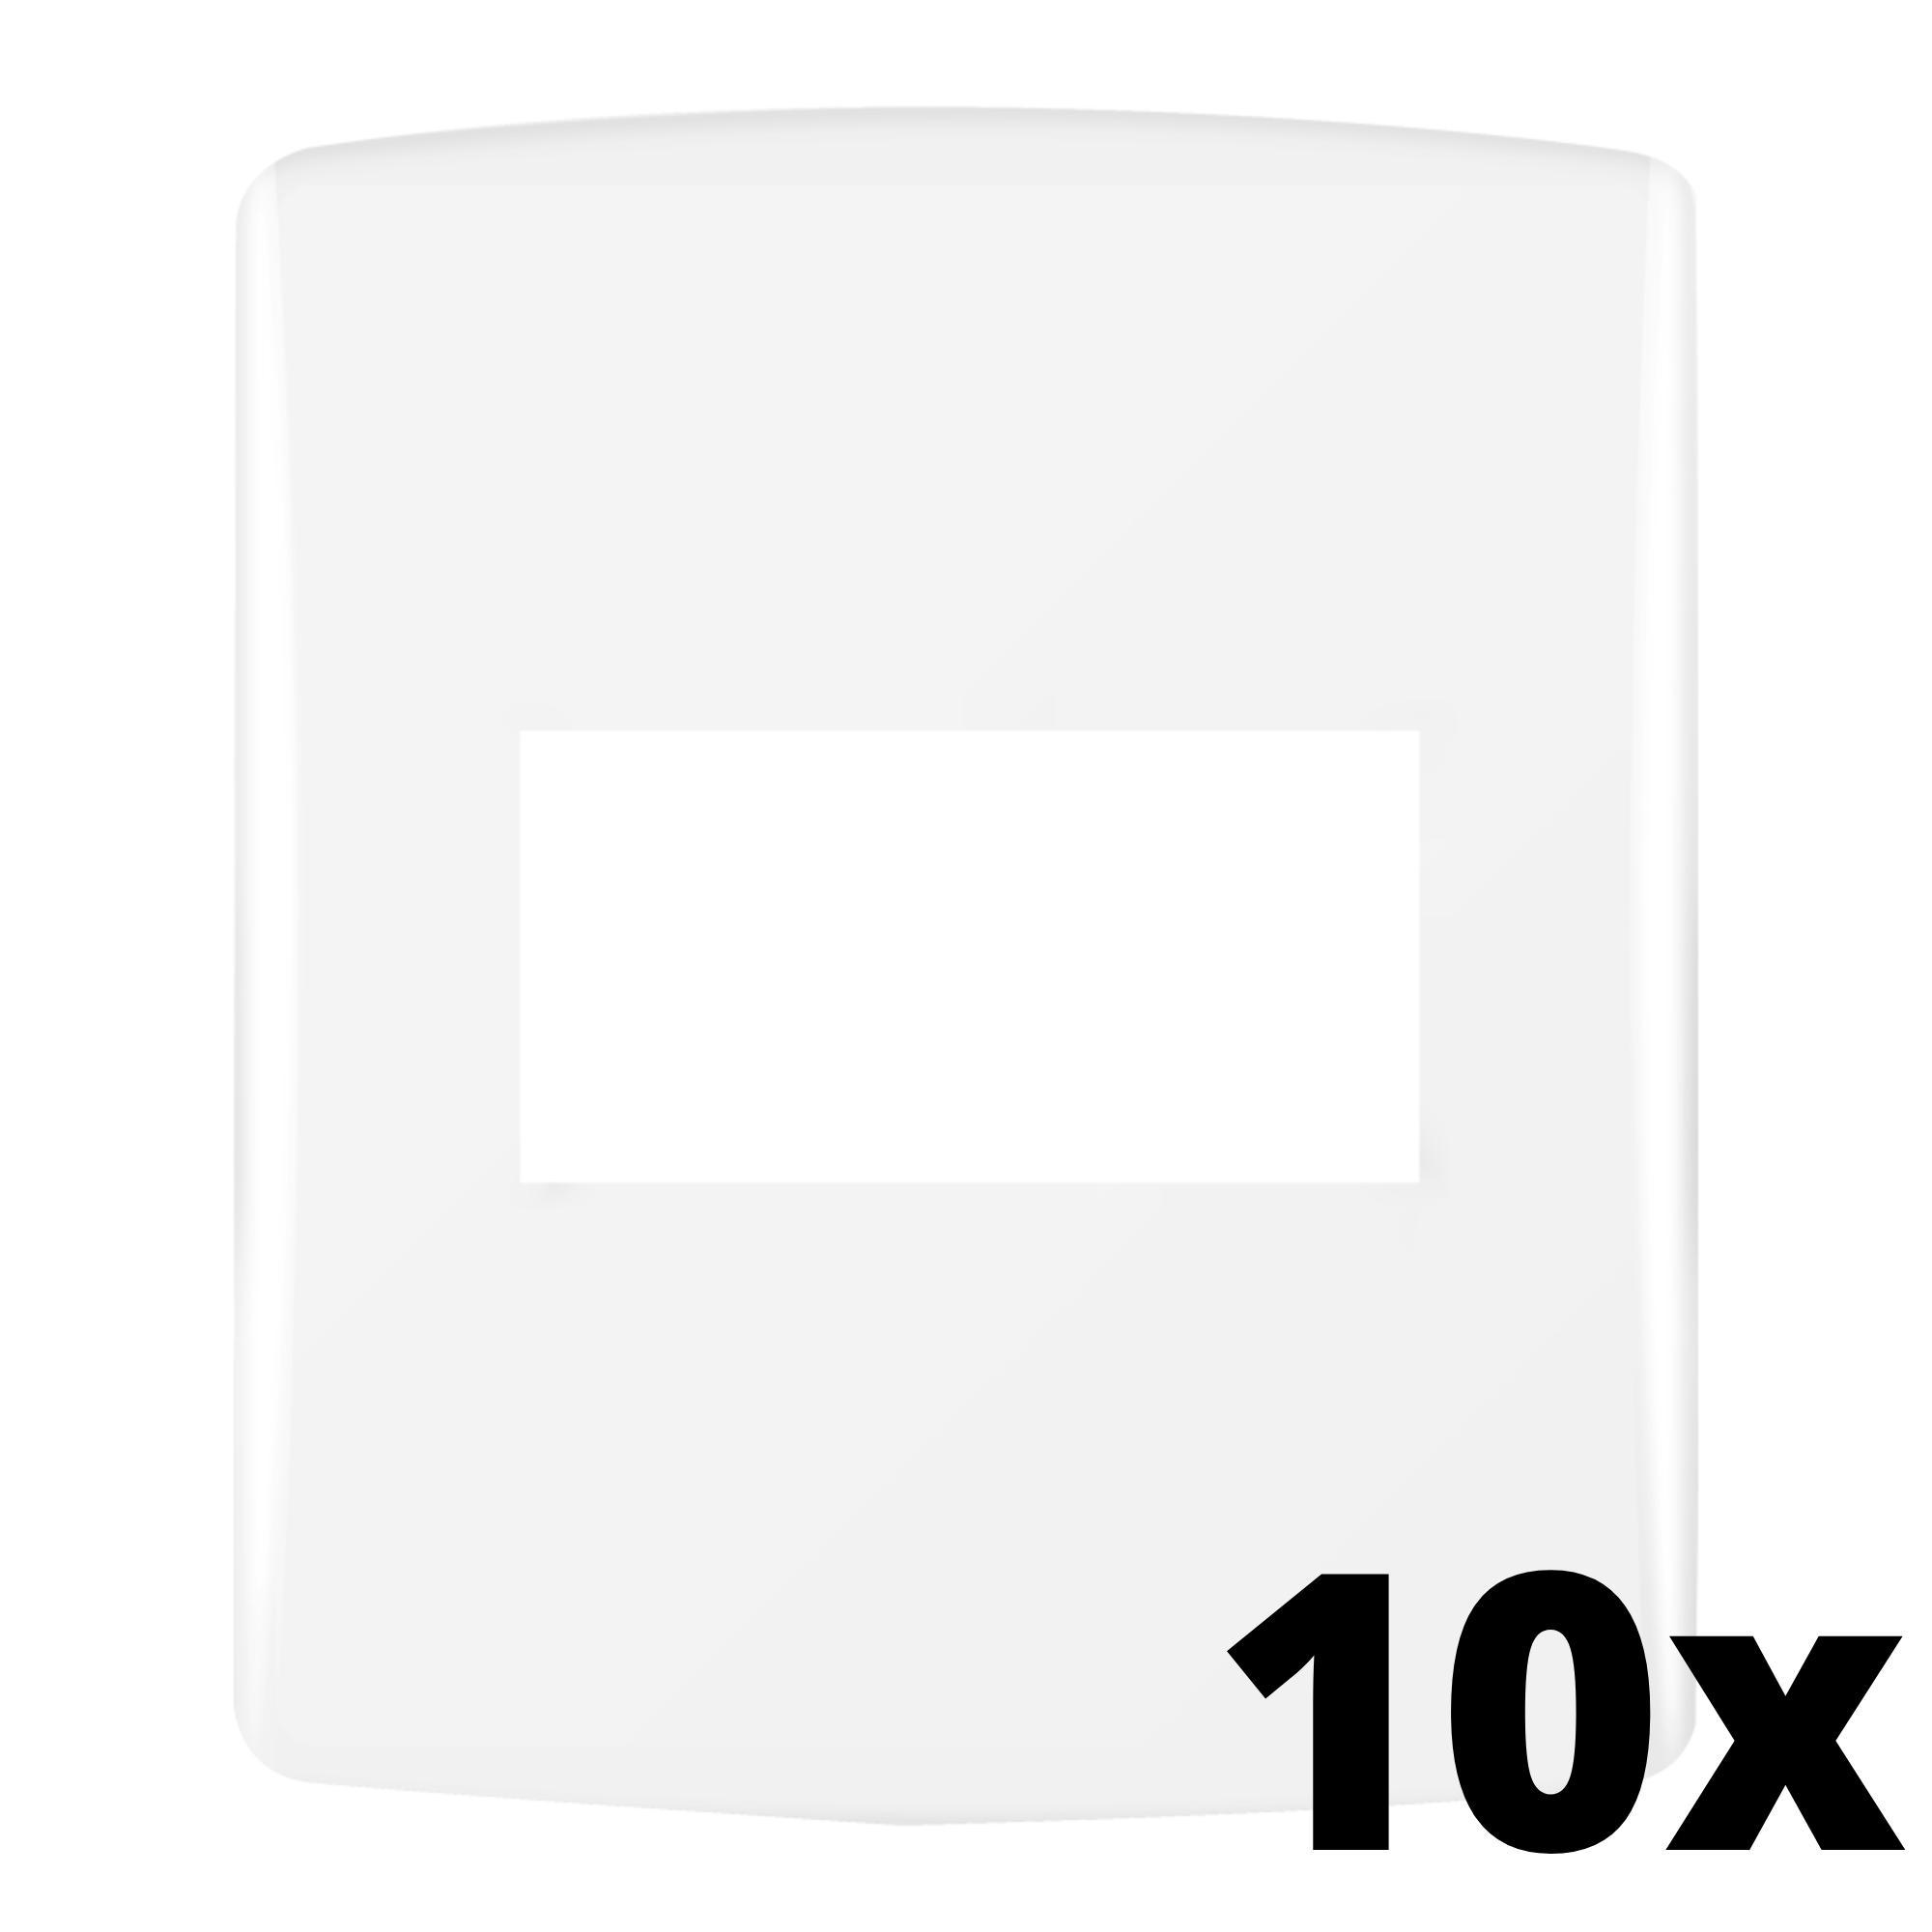 Kit 10 und Siena Fácil Placa 4x2 1 Seção